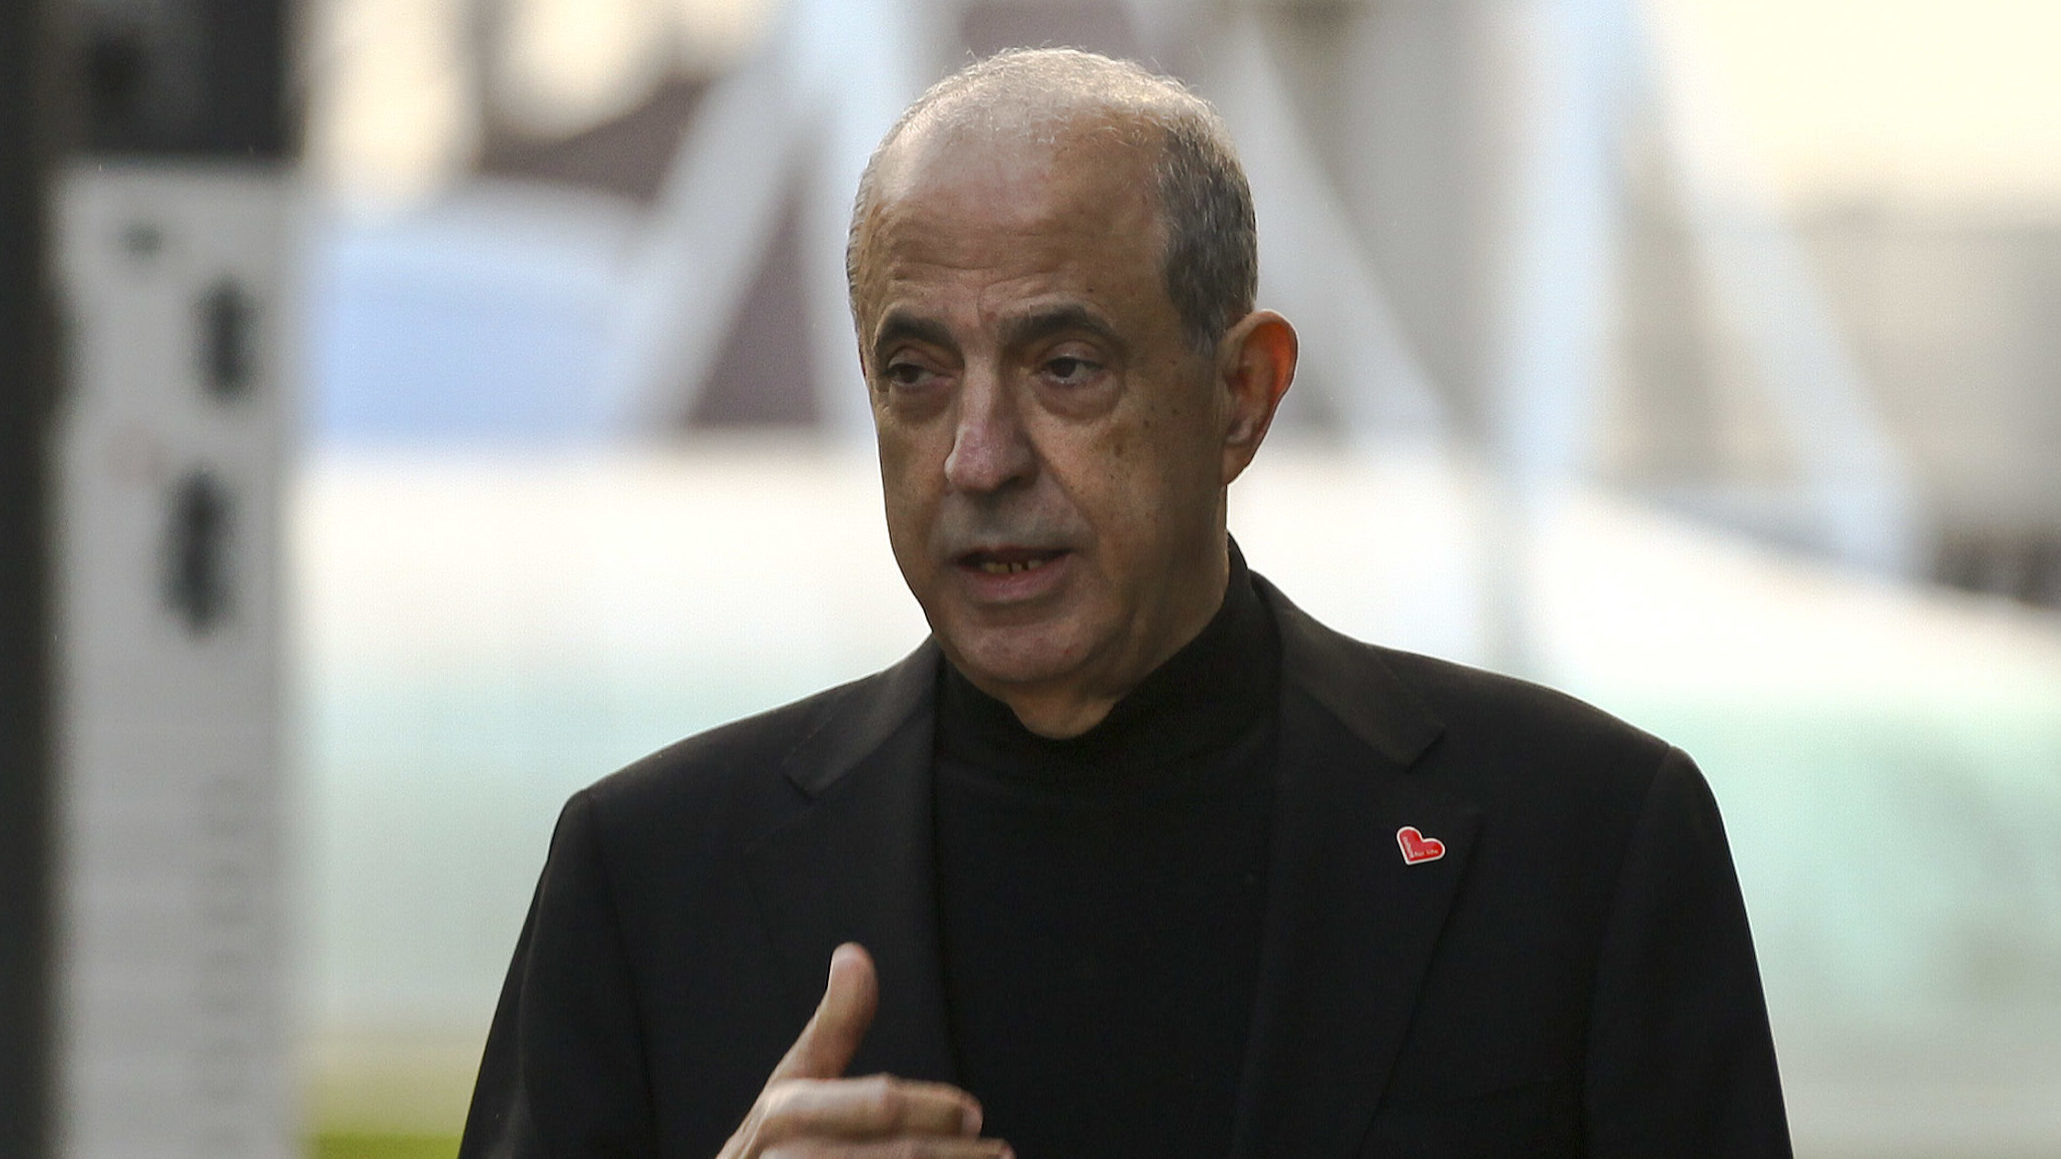 Justiça autoriza CGD a executar dívida de 6,6 milhões de Joe Berardo